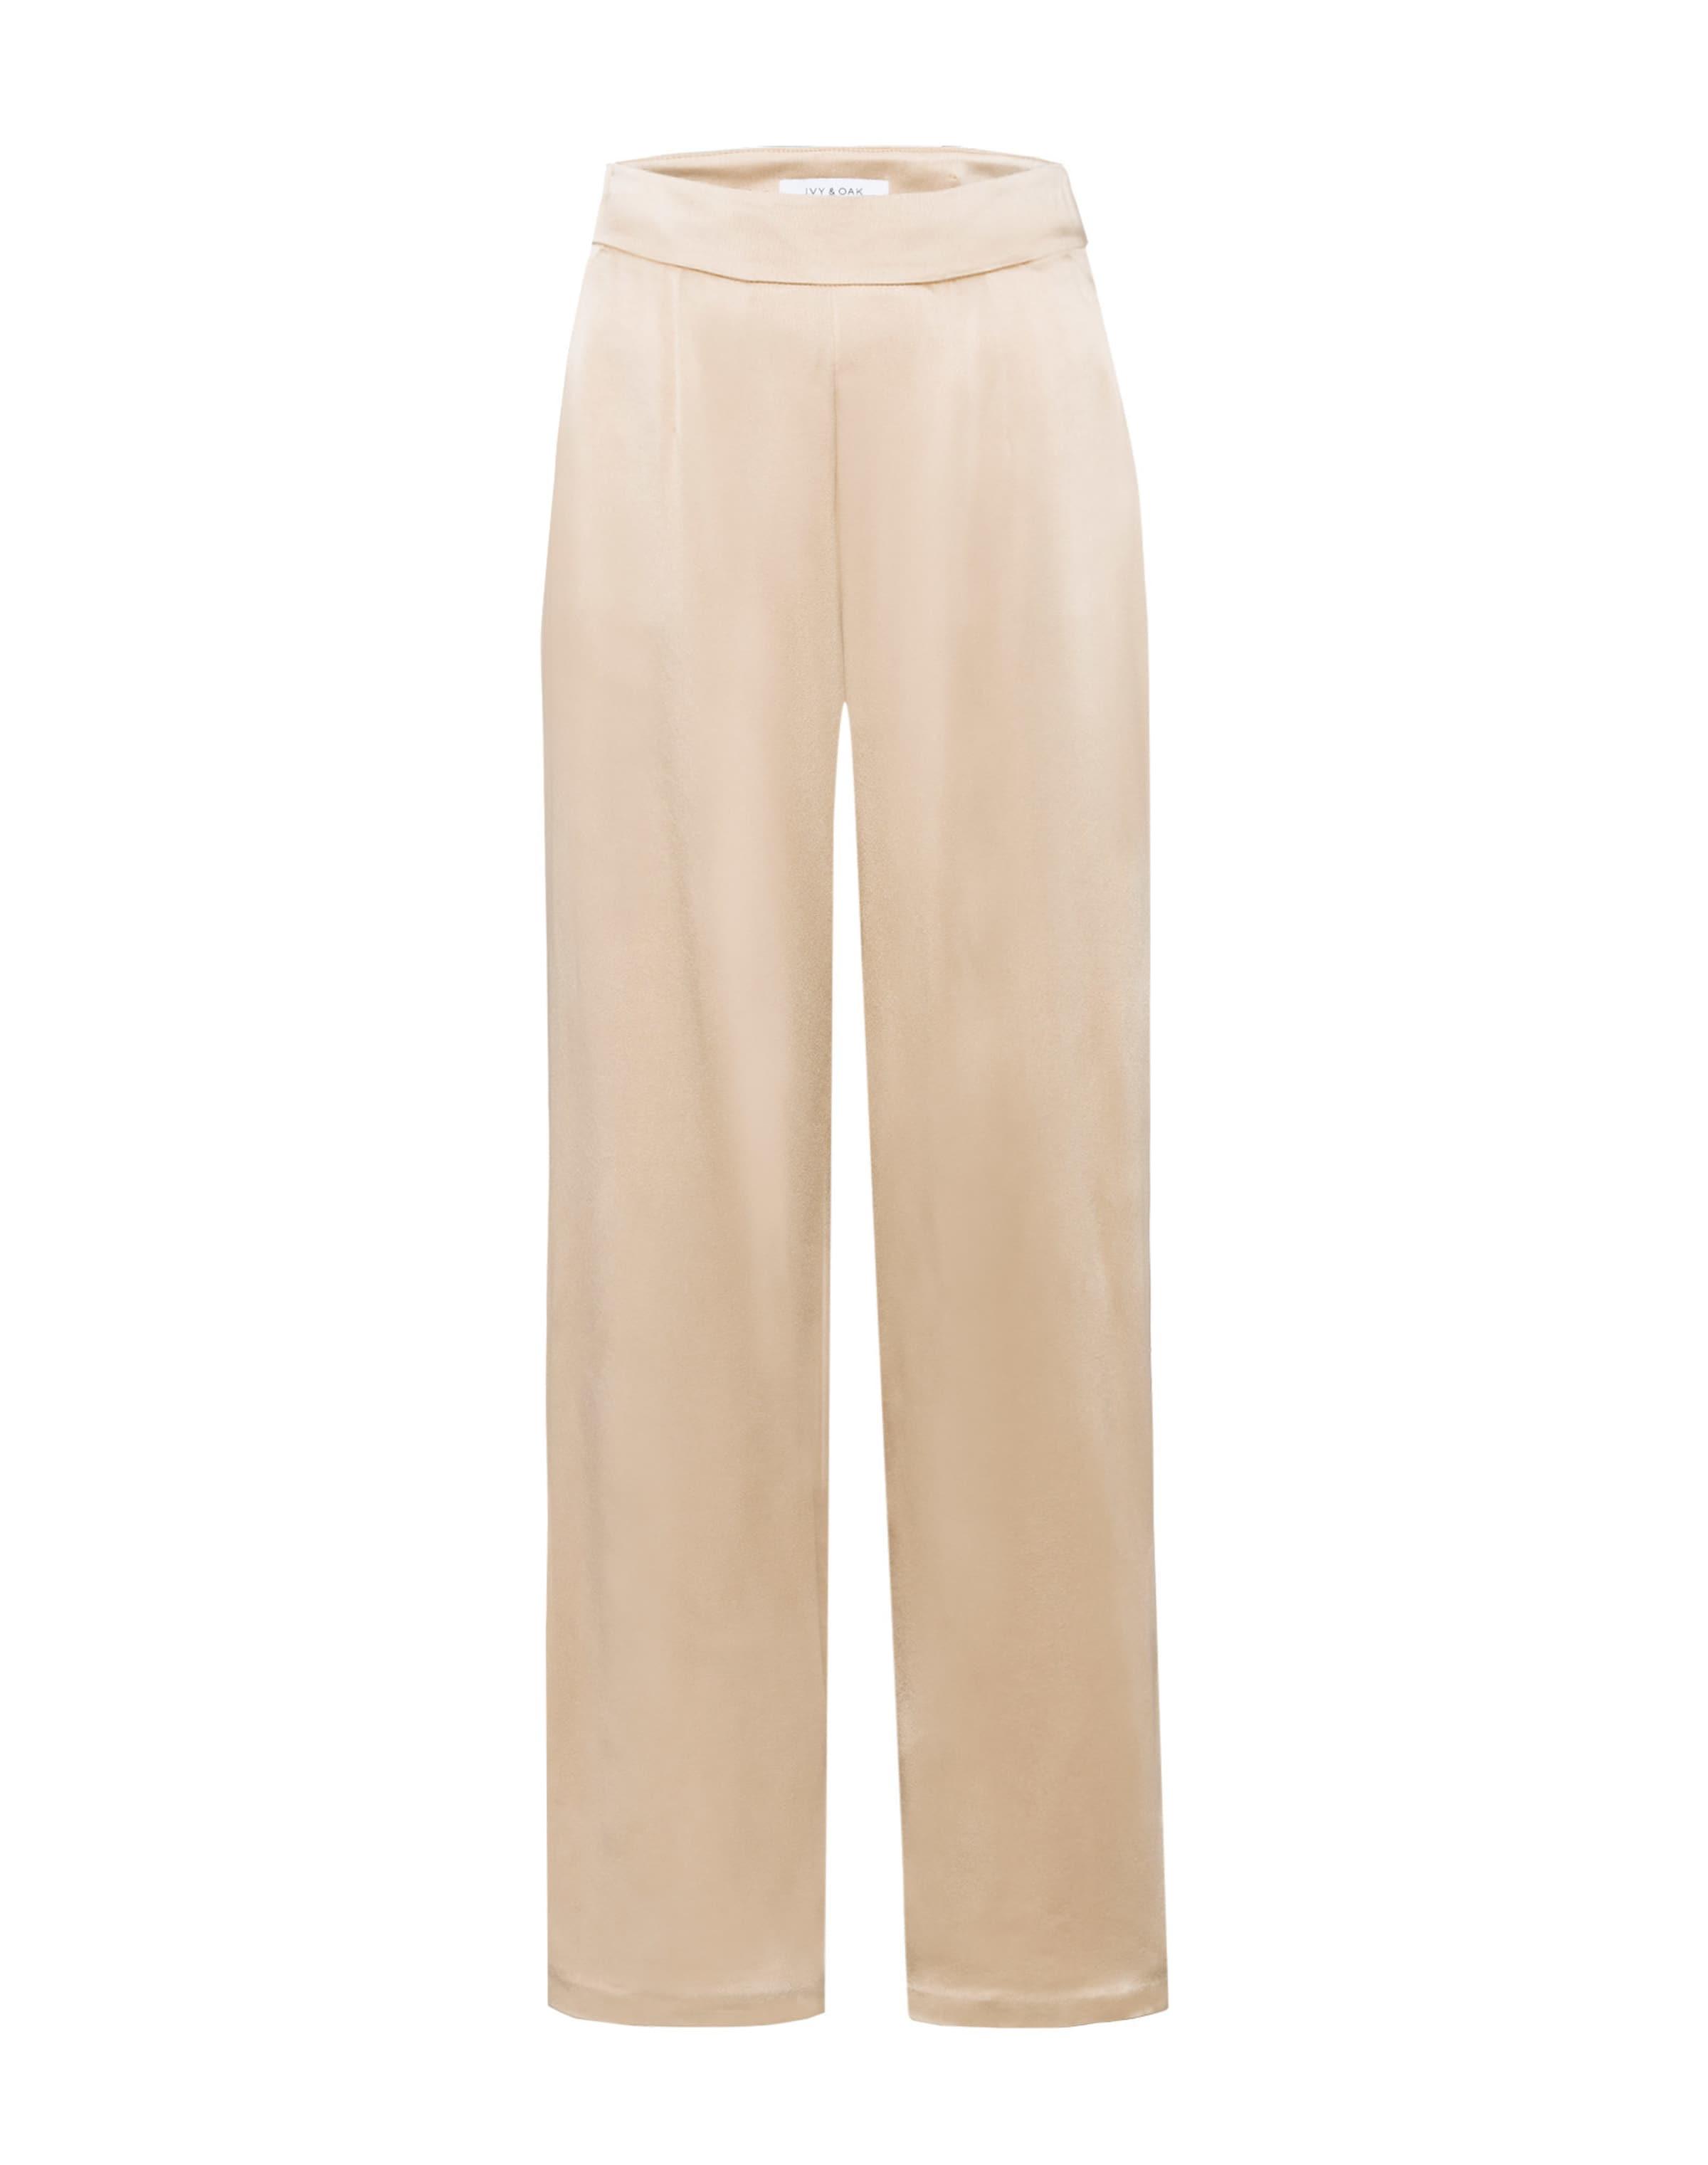 In Oak Ivyamp; 'marlene' Pantalon Crème jSMGLqUVzp